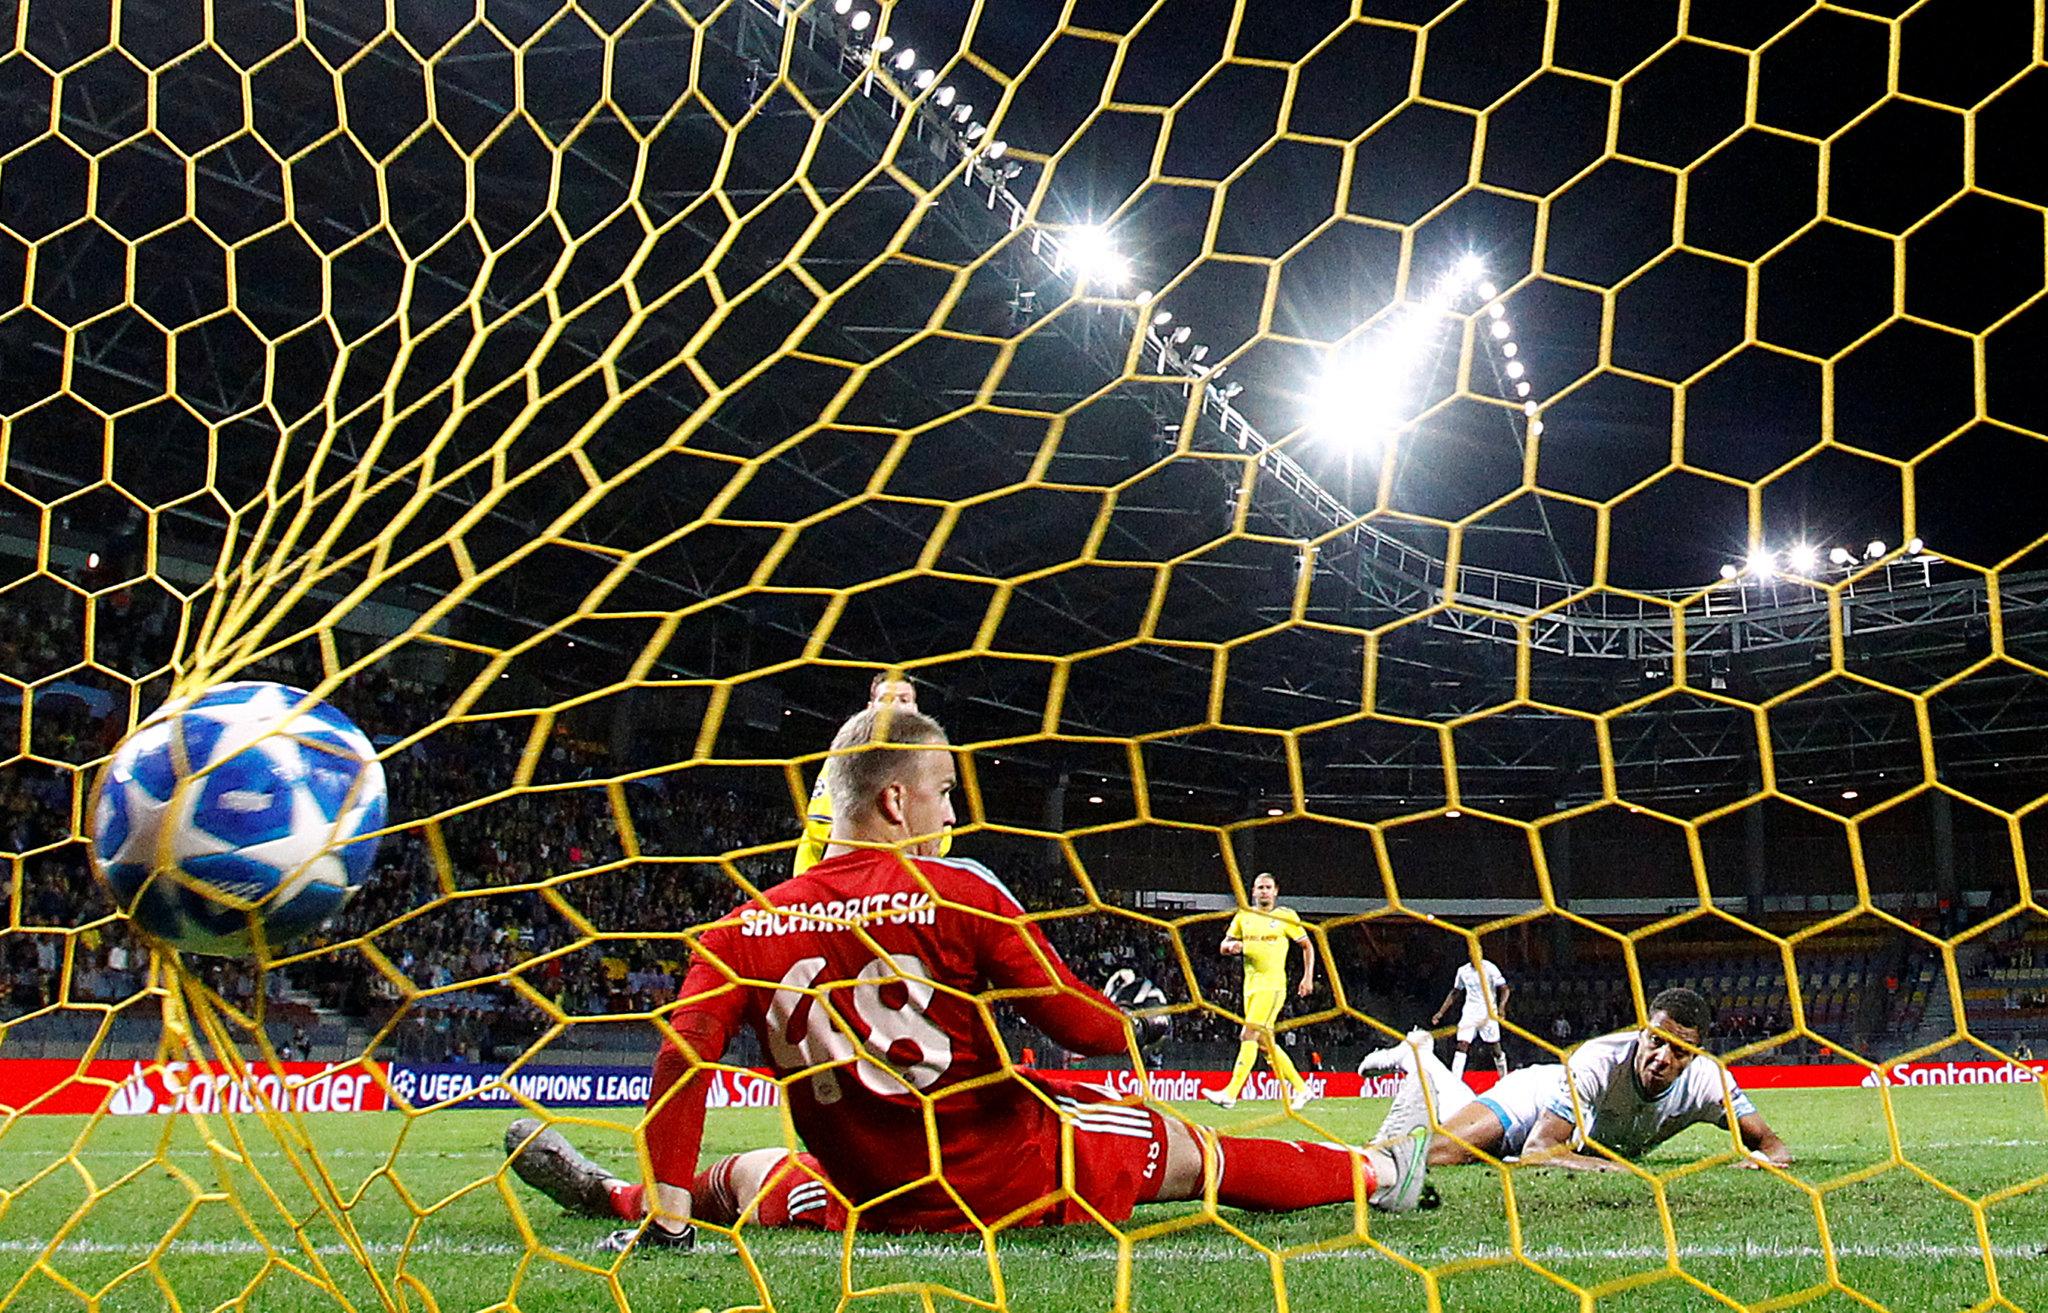 El gol del triunfo de Malen.